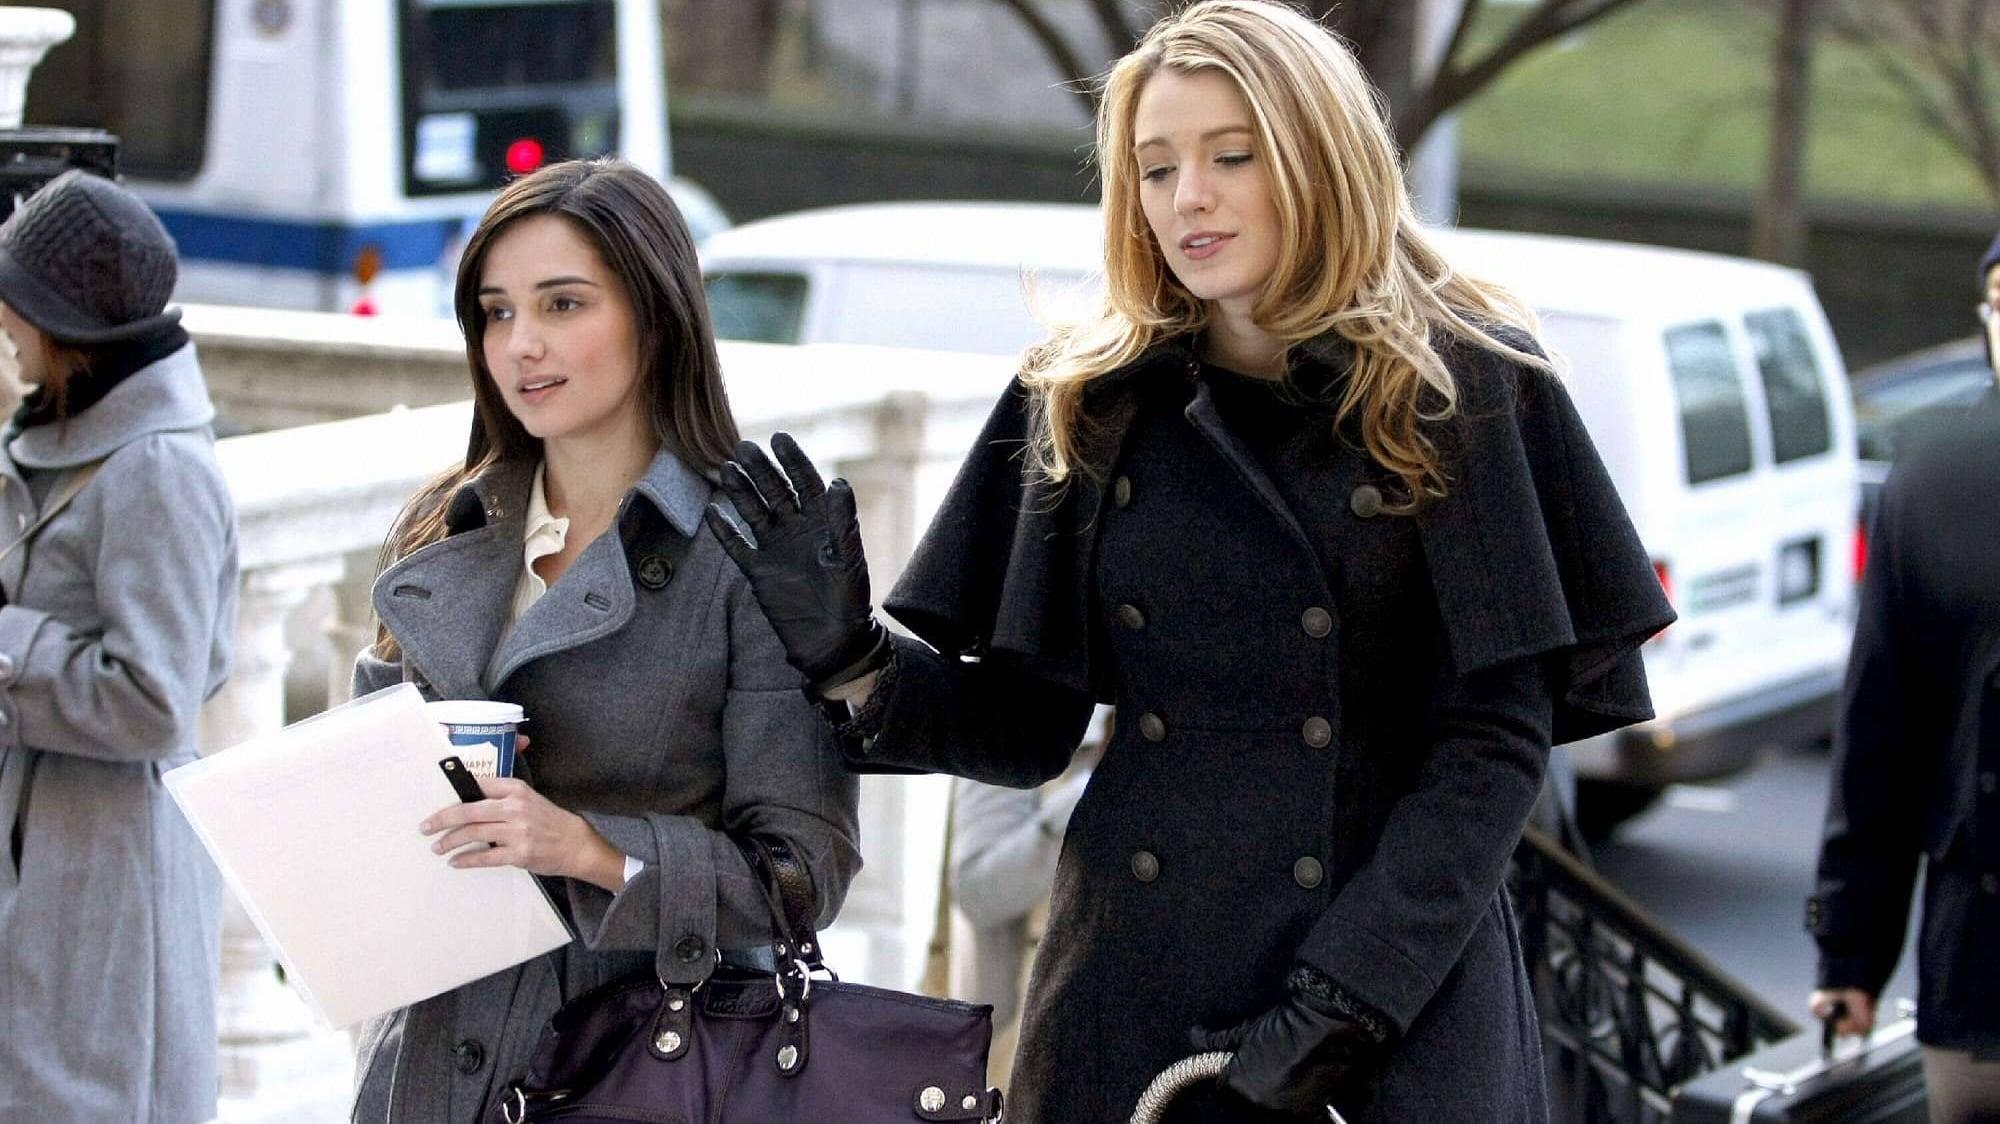 Watch Gossip Girl Season 1 For Free Online 123movies.com